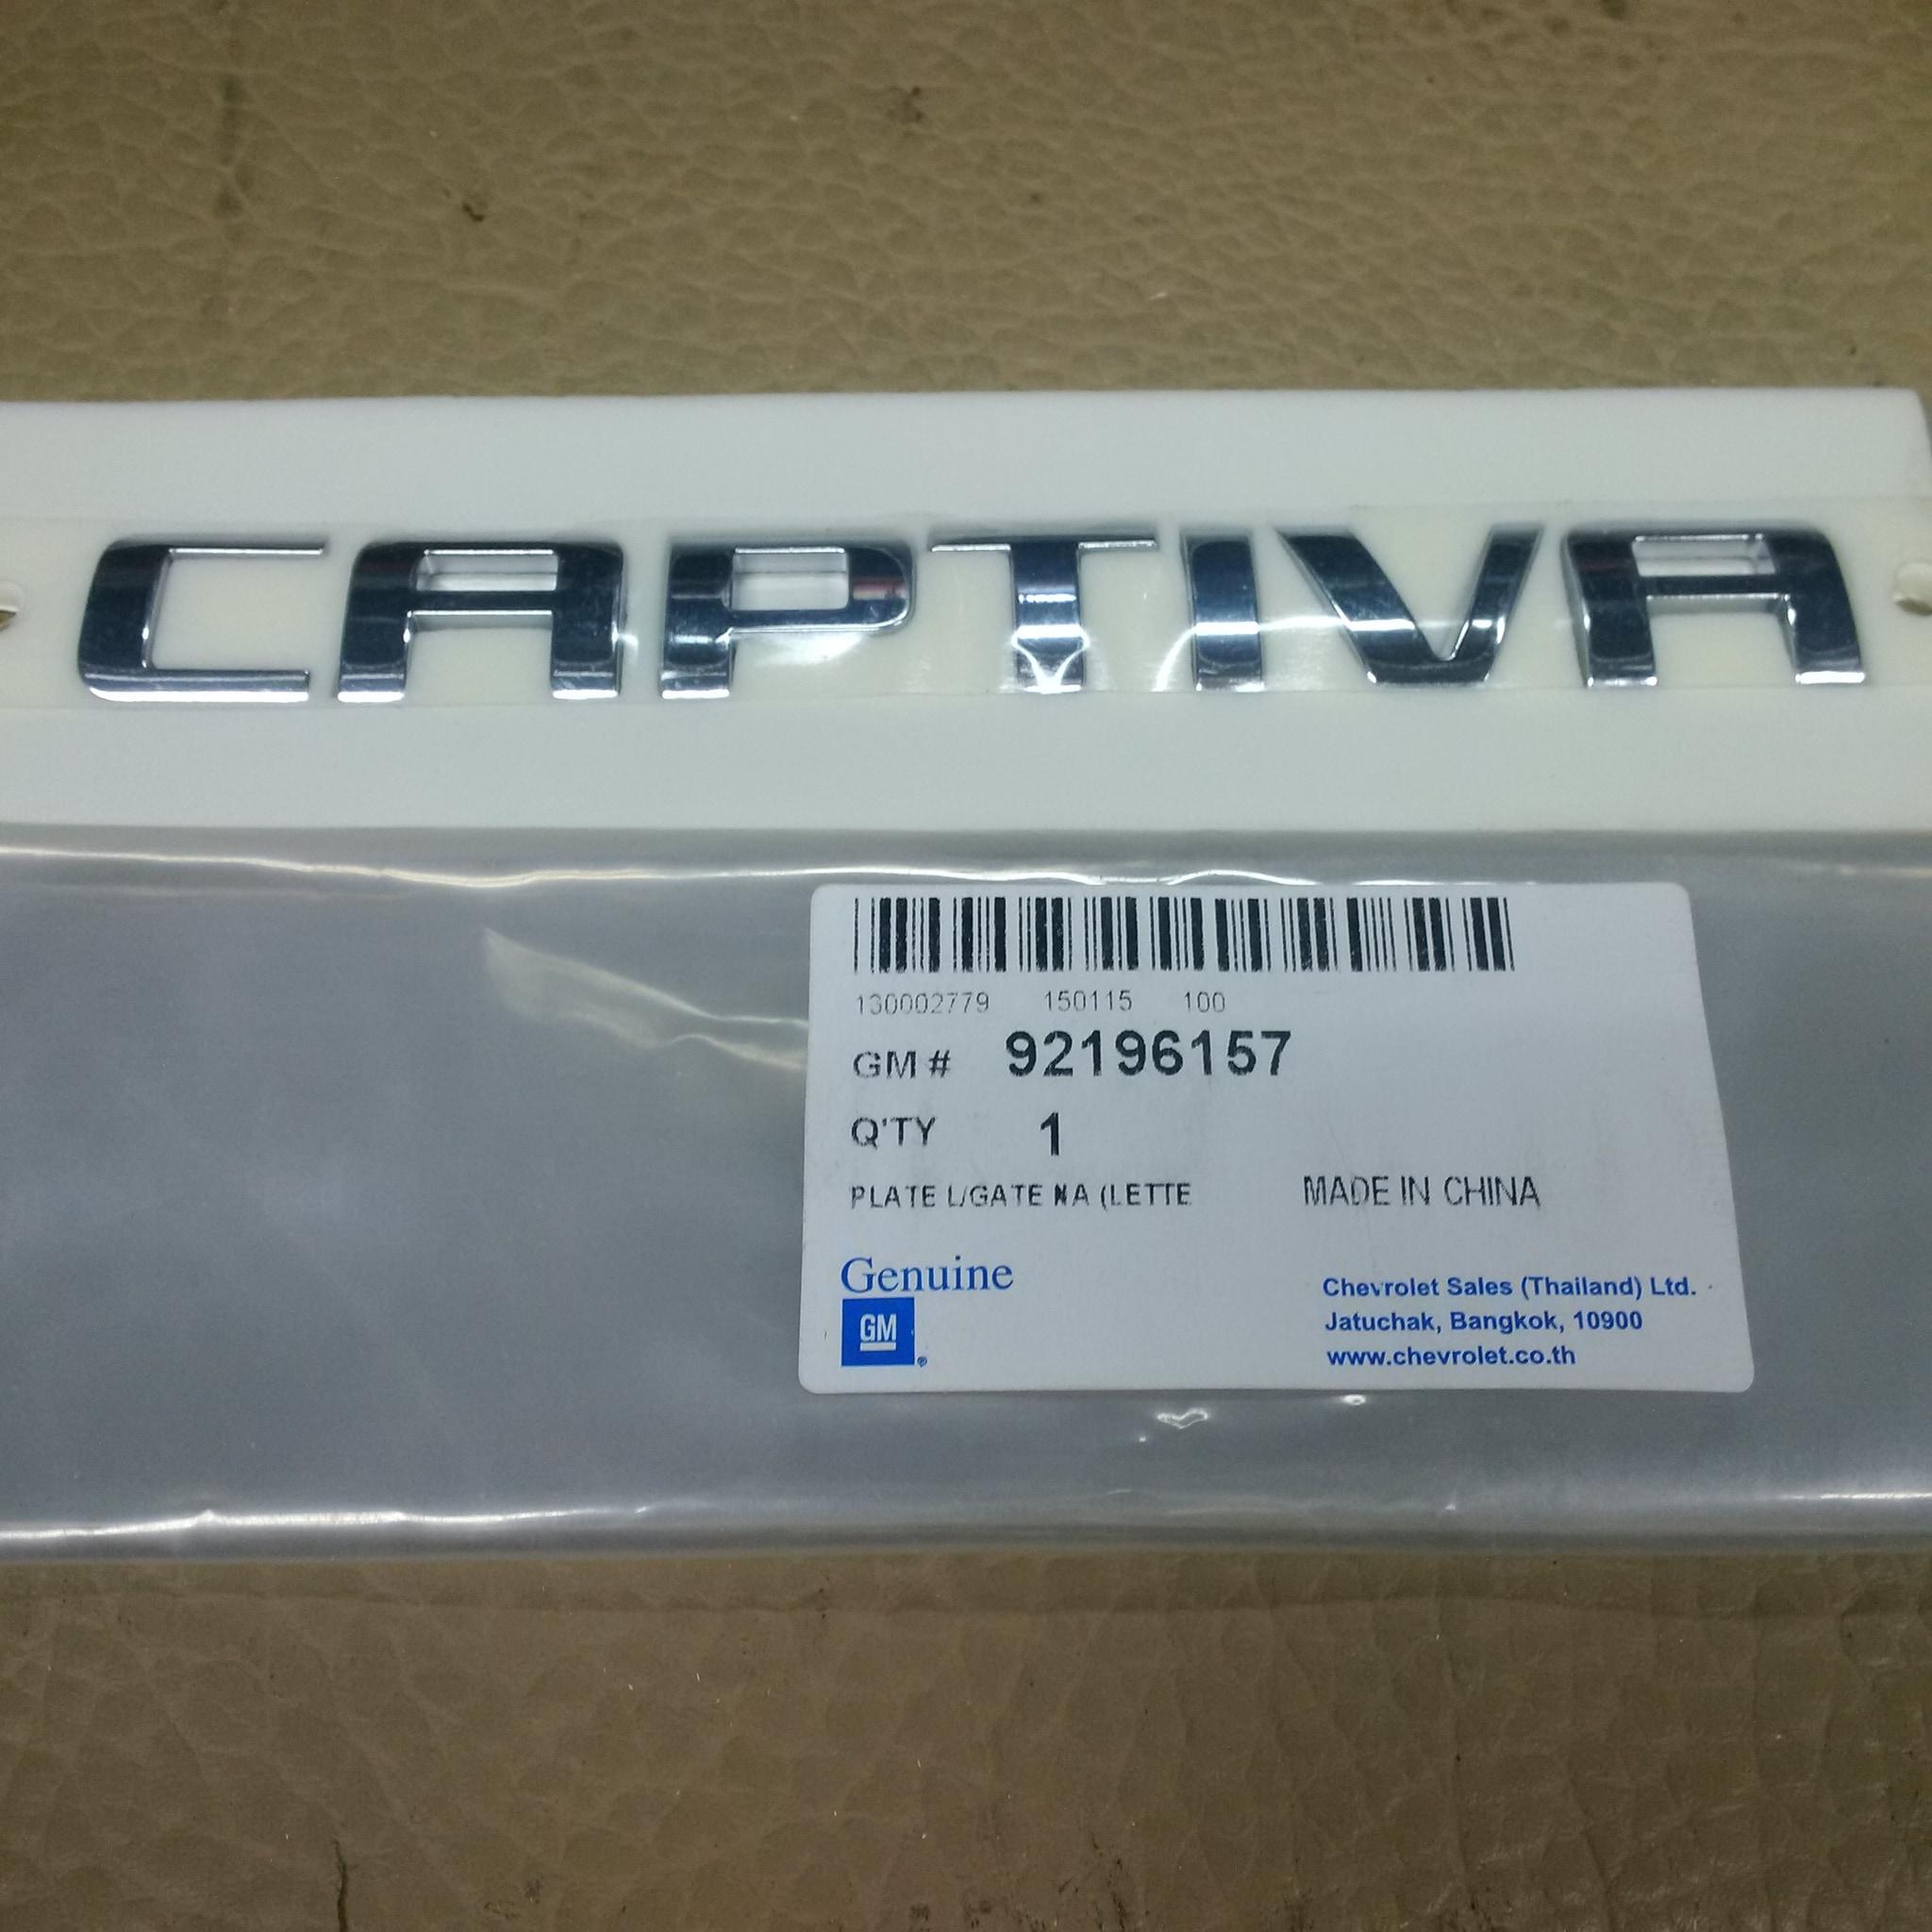 Chevrolet Captiva Logo Kaufen ✓ All About Chevrolet